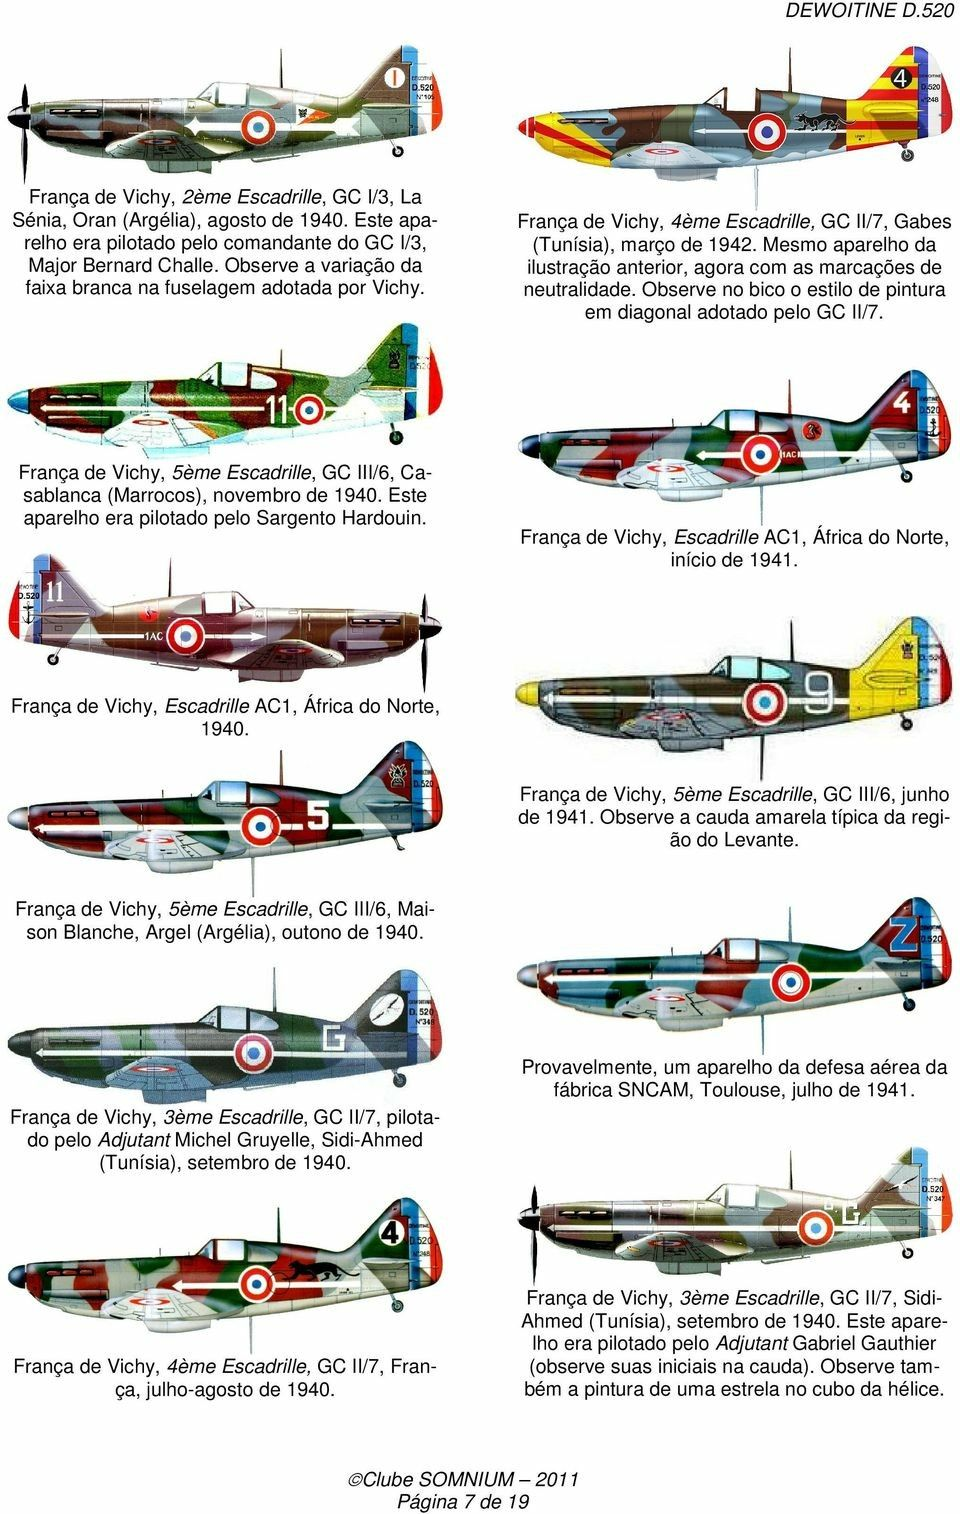 Epingle Par Ryan Graham Sur French Airforce Ww Ii Dewoitine 520 Armee De L Air Armee Francaise